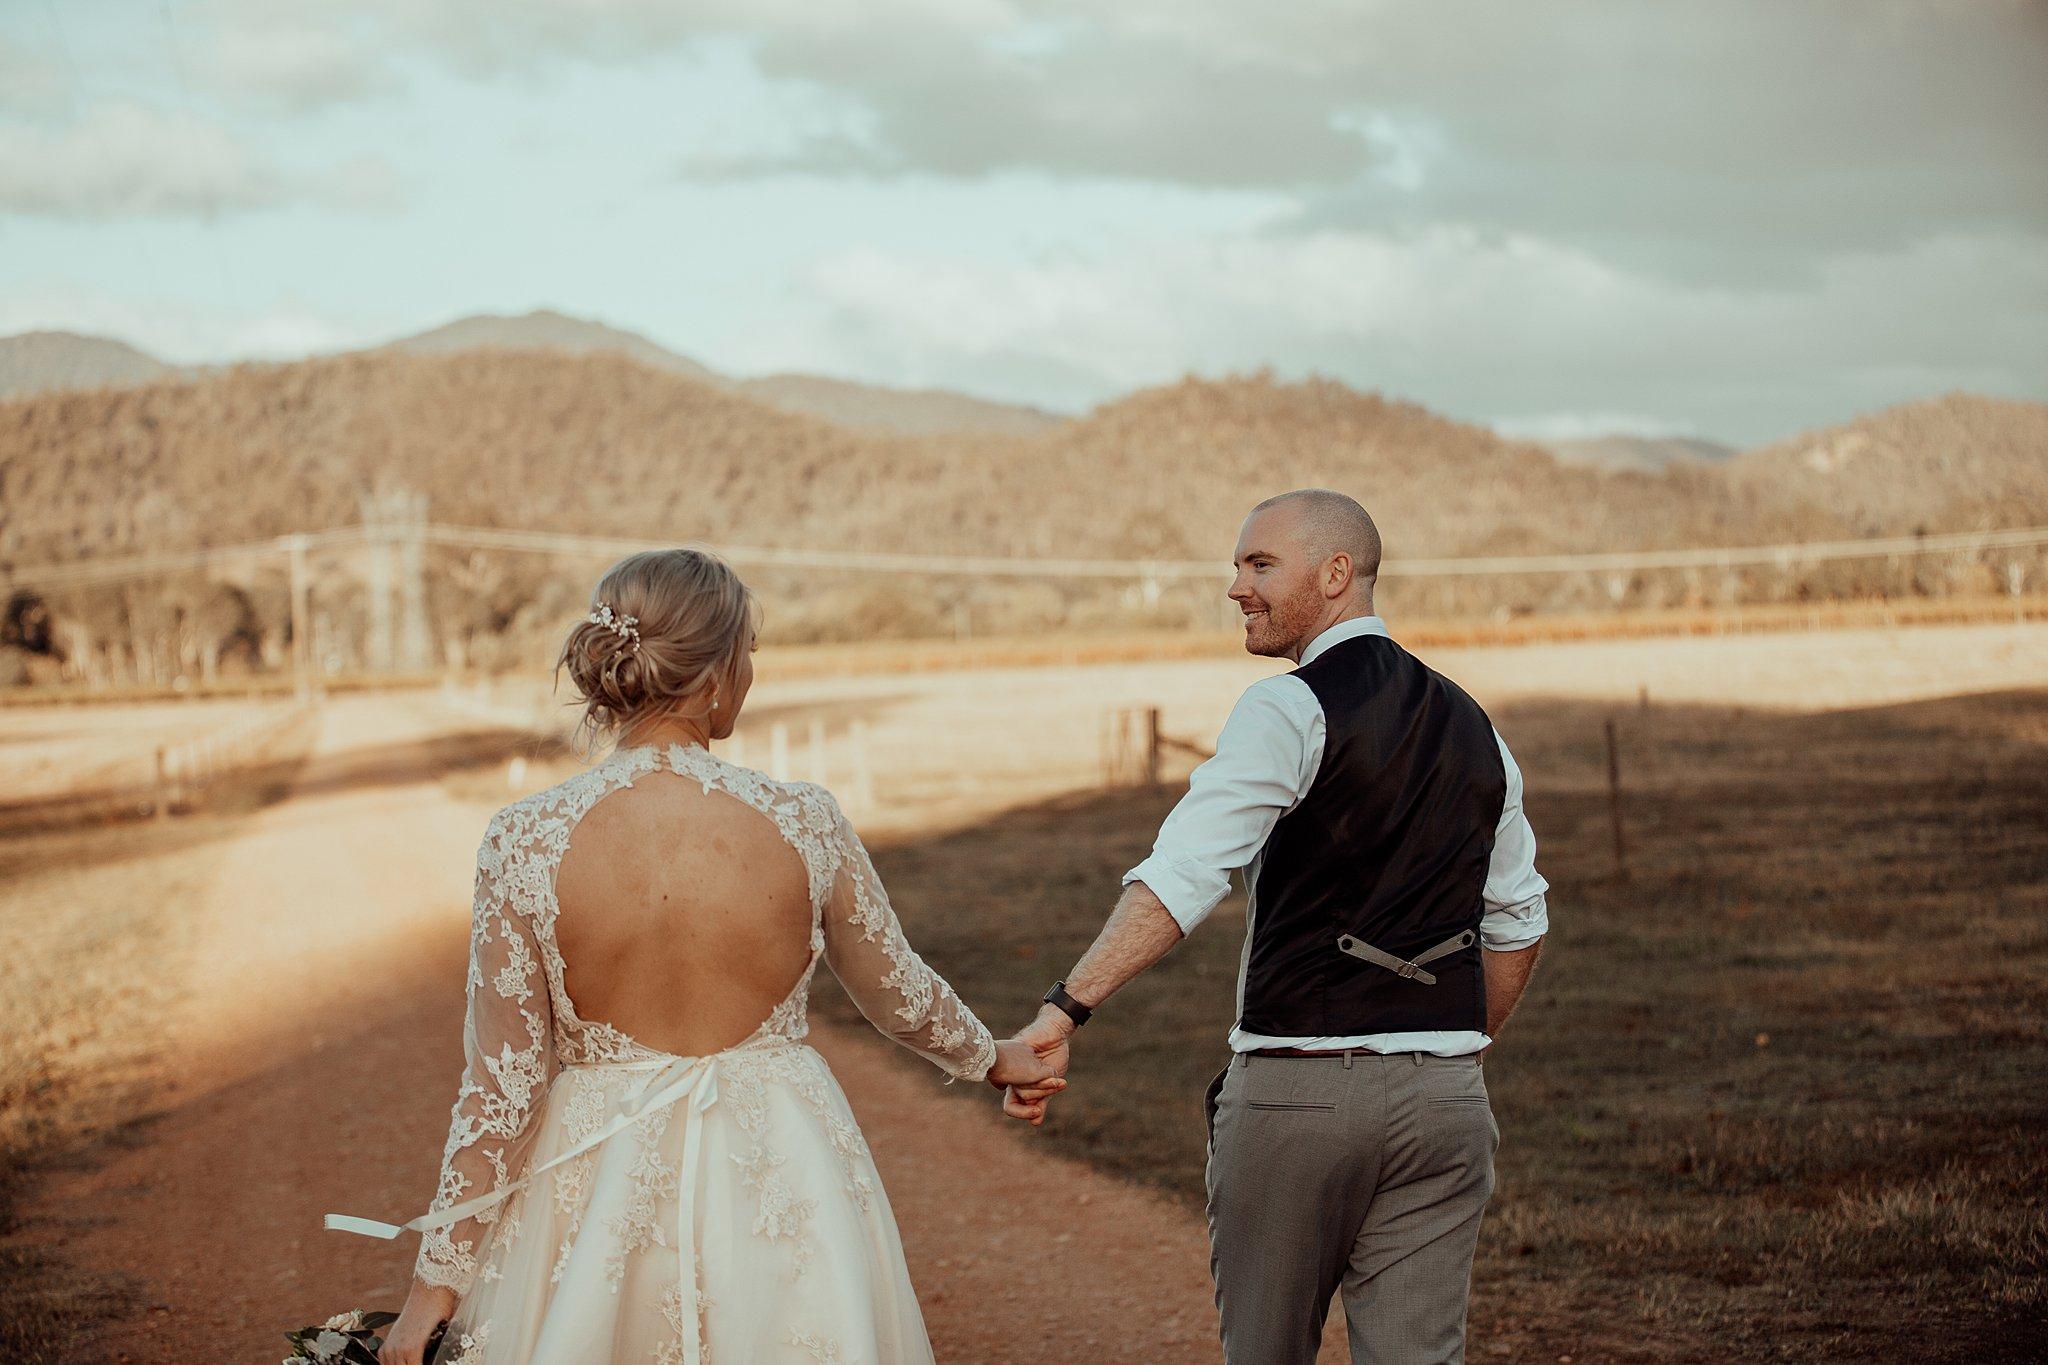 mickalathomas_puremacphotography_weddingphotographer_couplephotographer_Sheppartonphotographer_3471.jpg